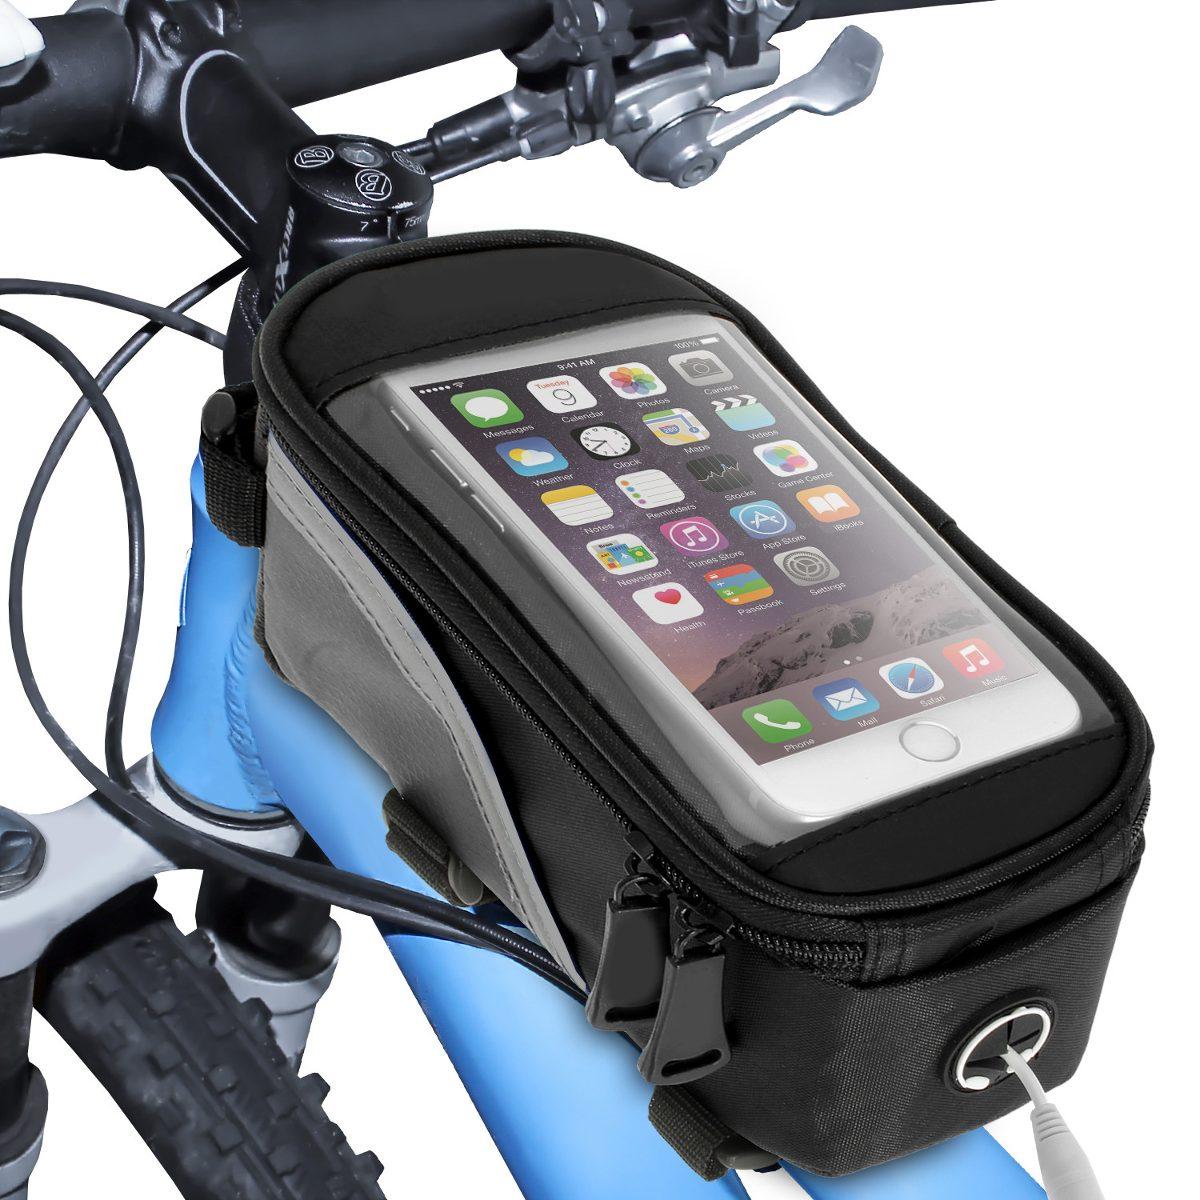 Accesorios bicicletas soporte celular smartphone lleva for Accesorios para smartphone